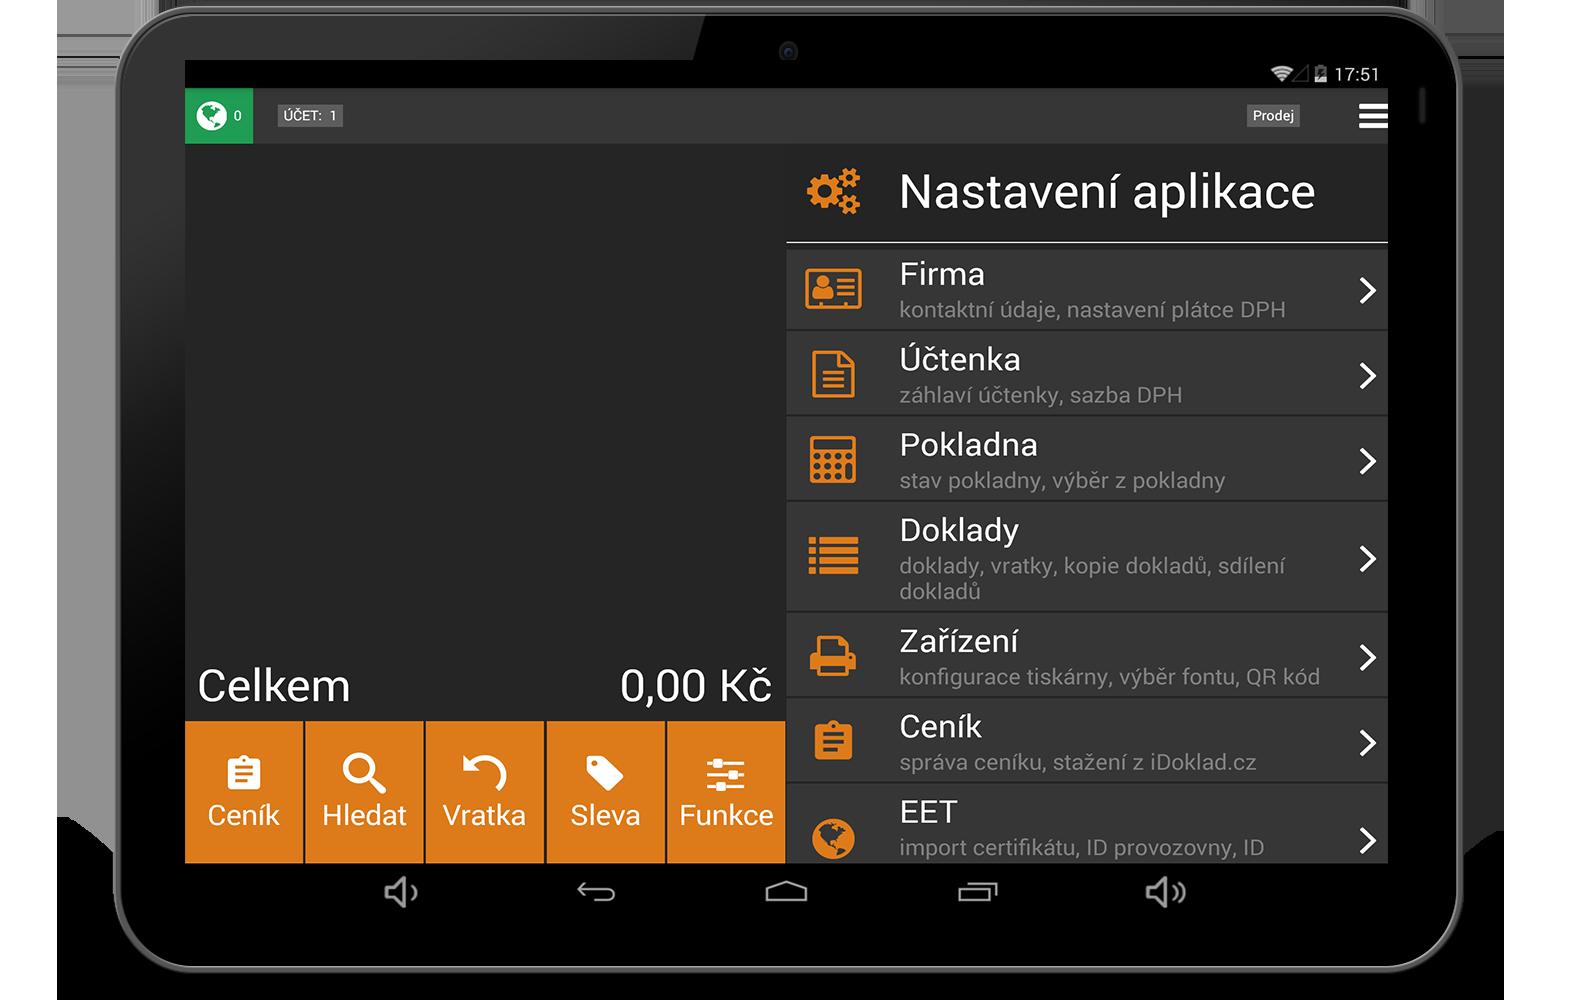 Profi Uctenka Pro Android V Novem Vylepseni Pro Ios A Windows